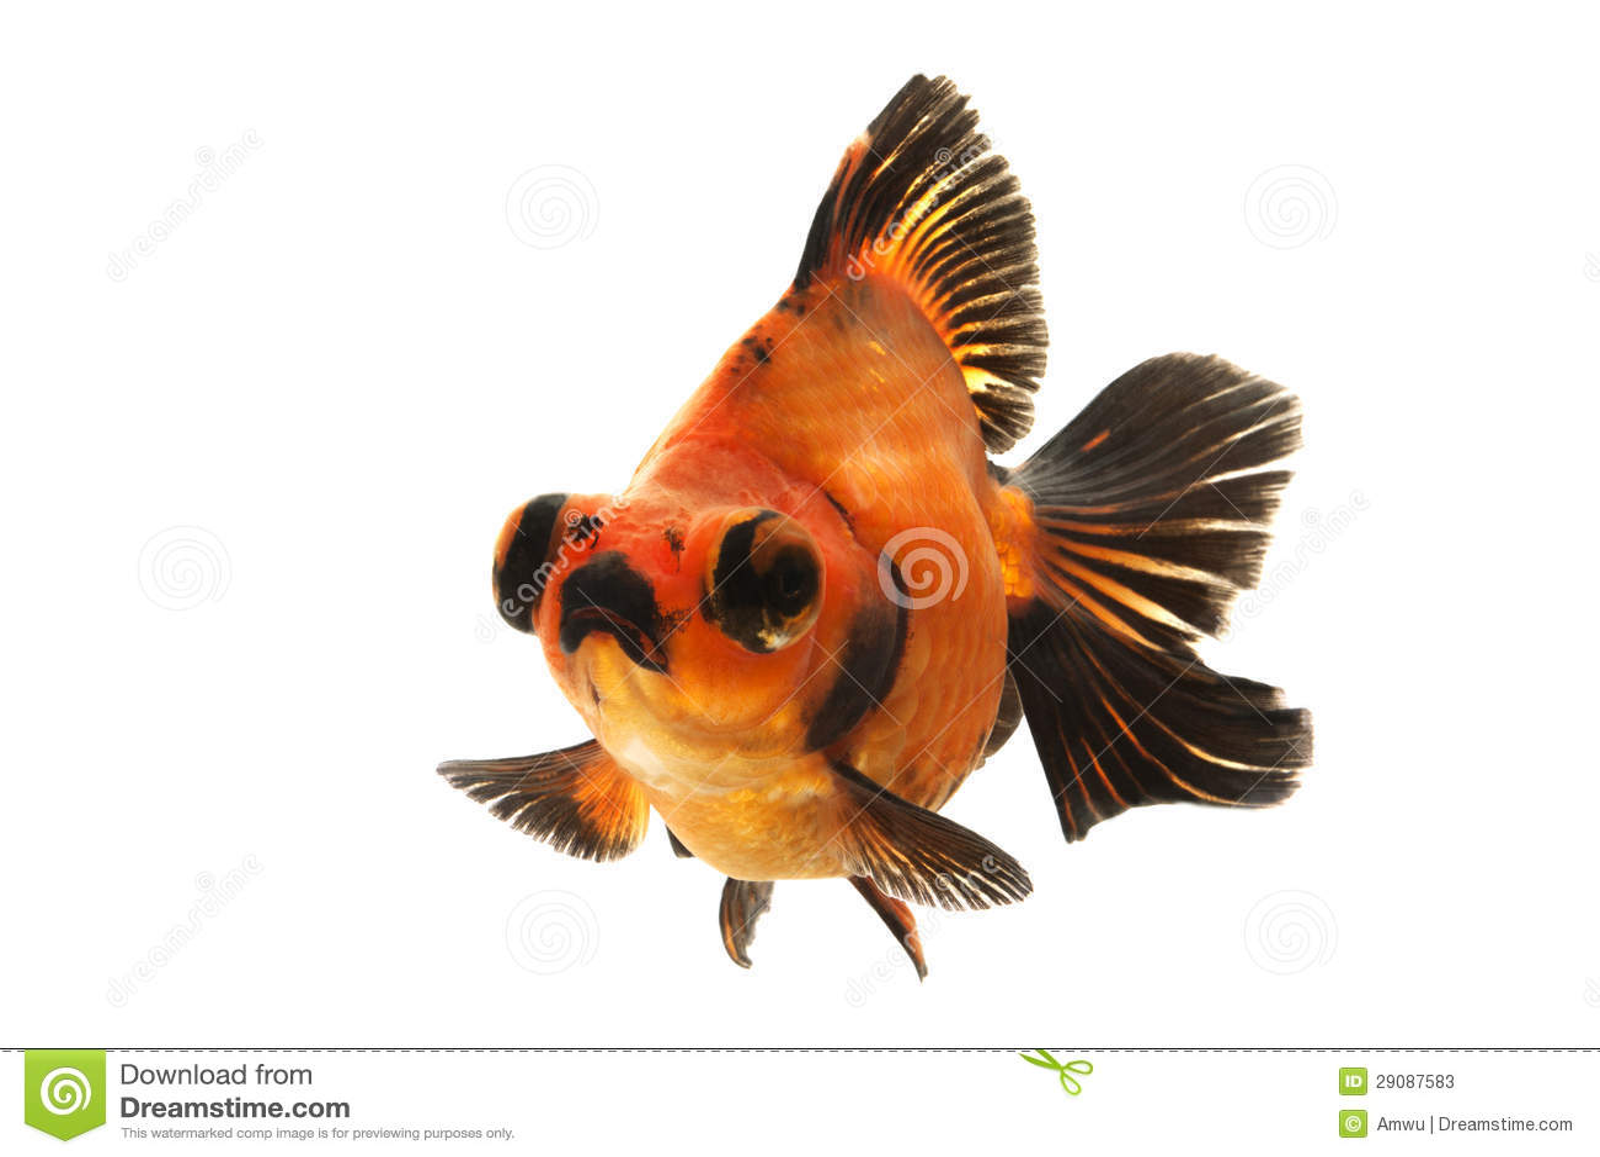 Poisson rouge noir et rouge photos stock image 29087583 for Prix poisson rouge tunisie